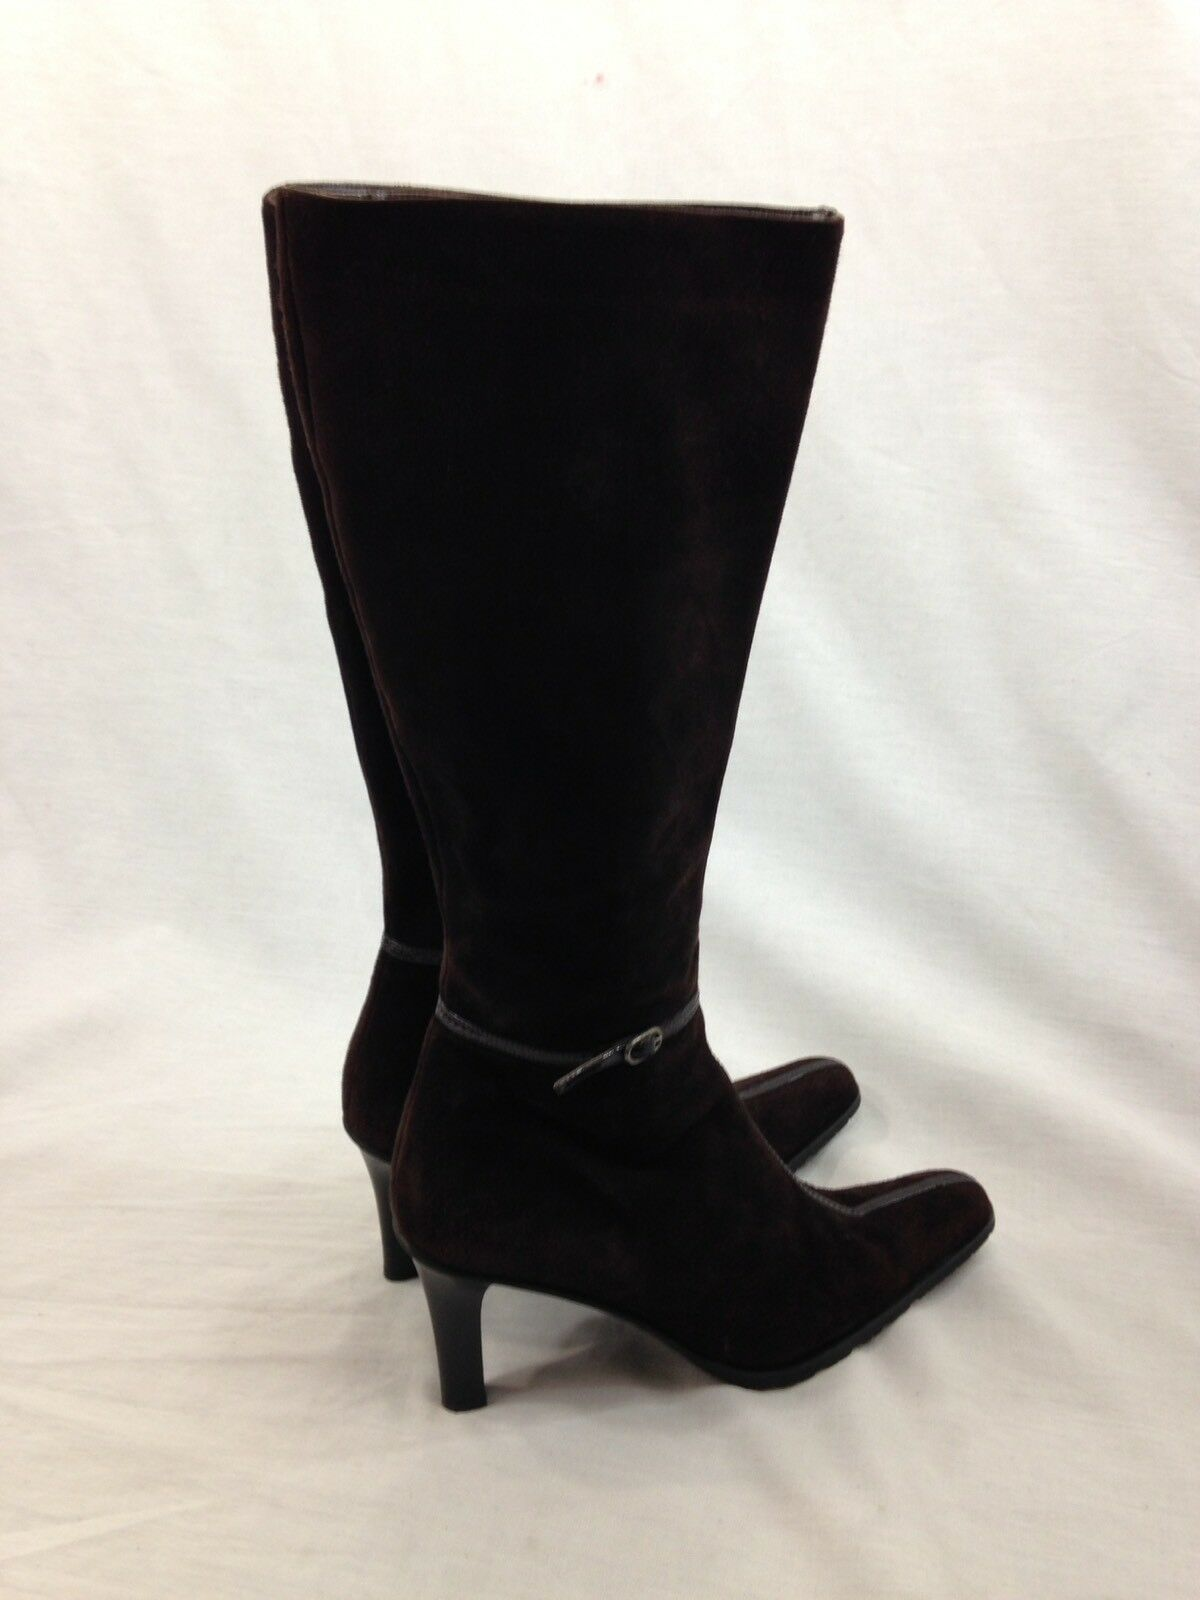 Bellofatto Boot Damens Tall 9 Braun Leder Suede Tall Damens Stiletto Side Zip Buckle  571996